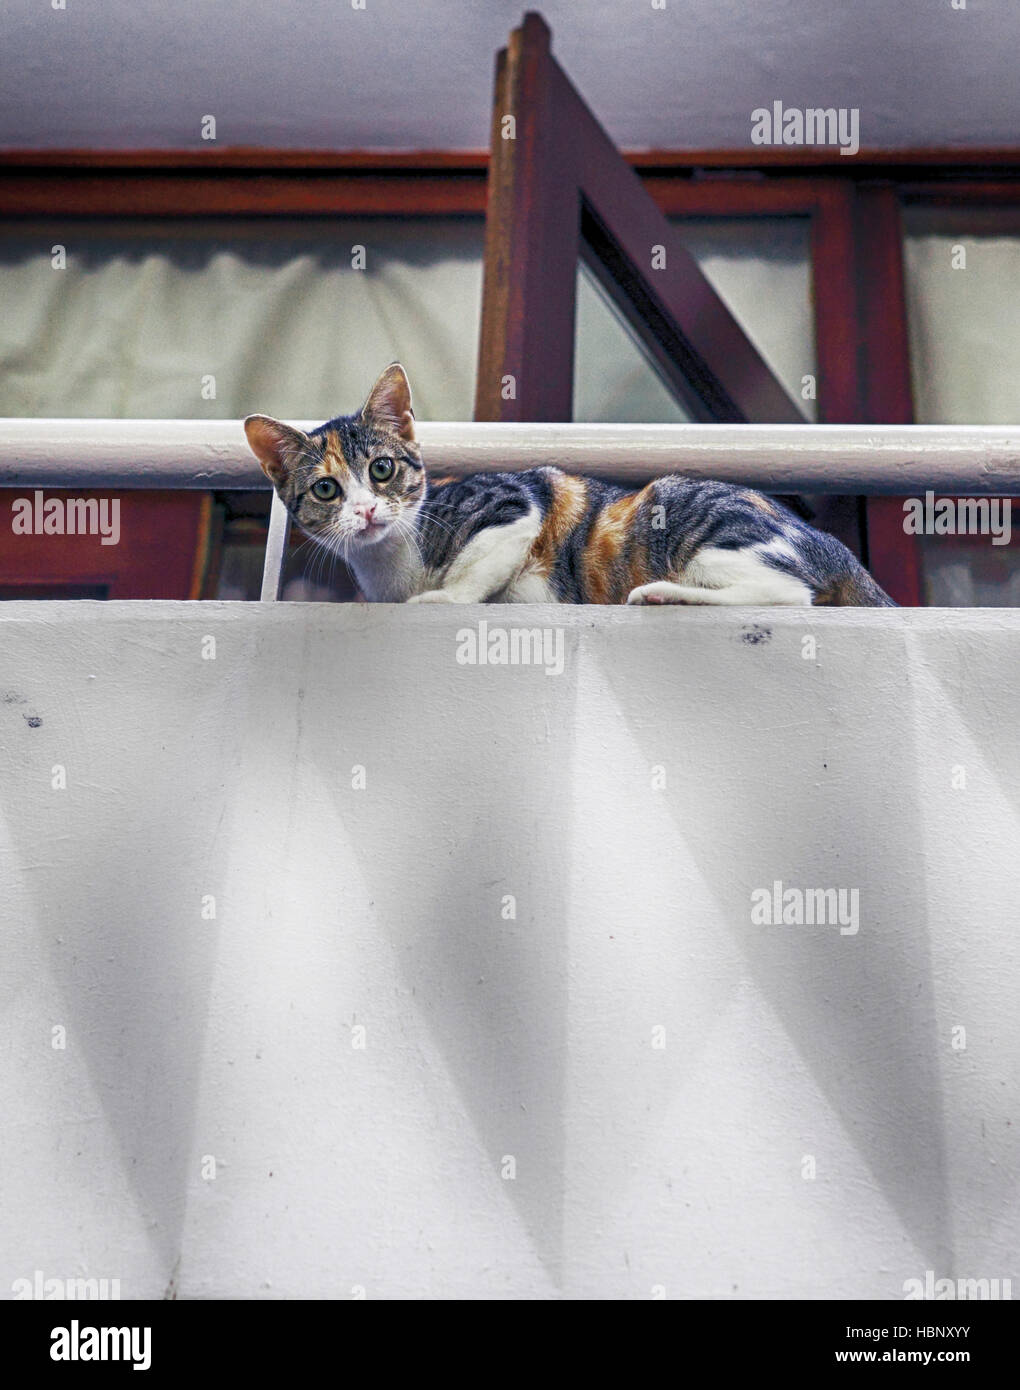 cat on balkony Stock Photo